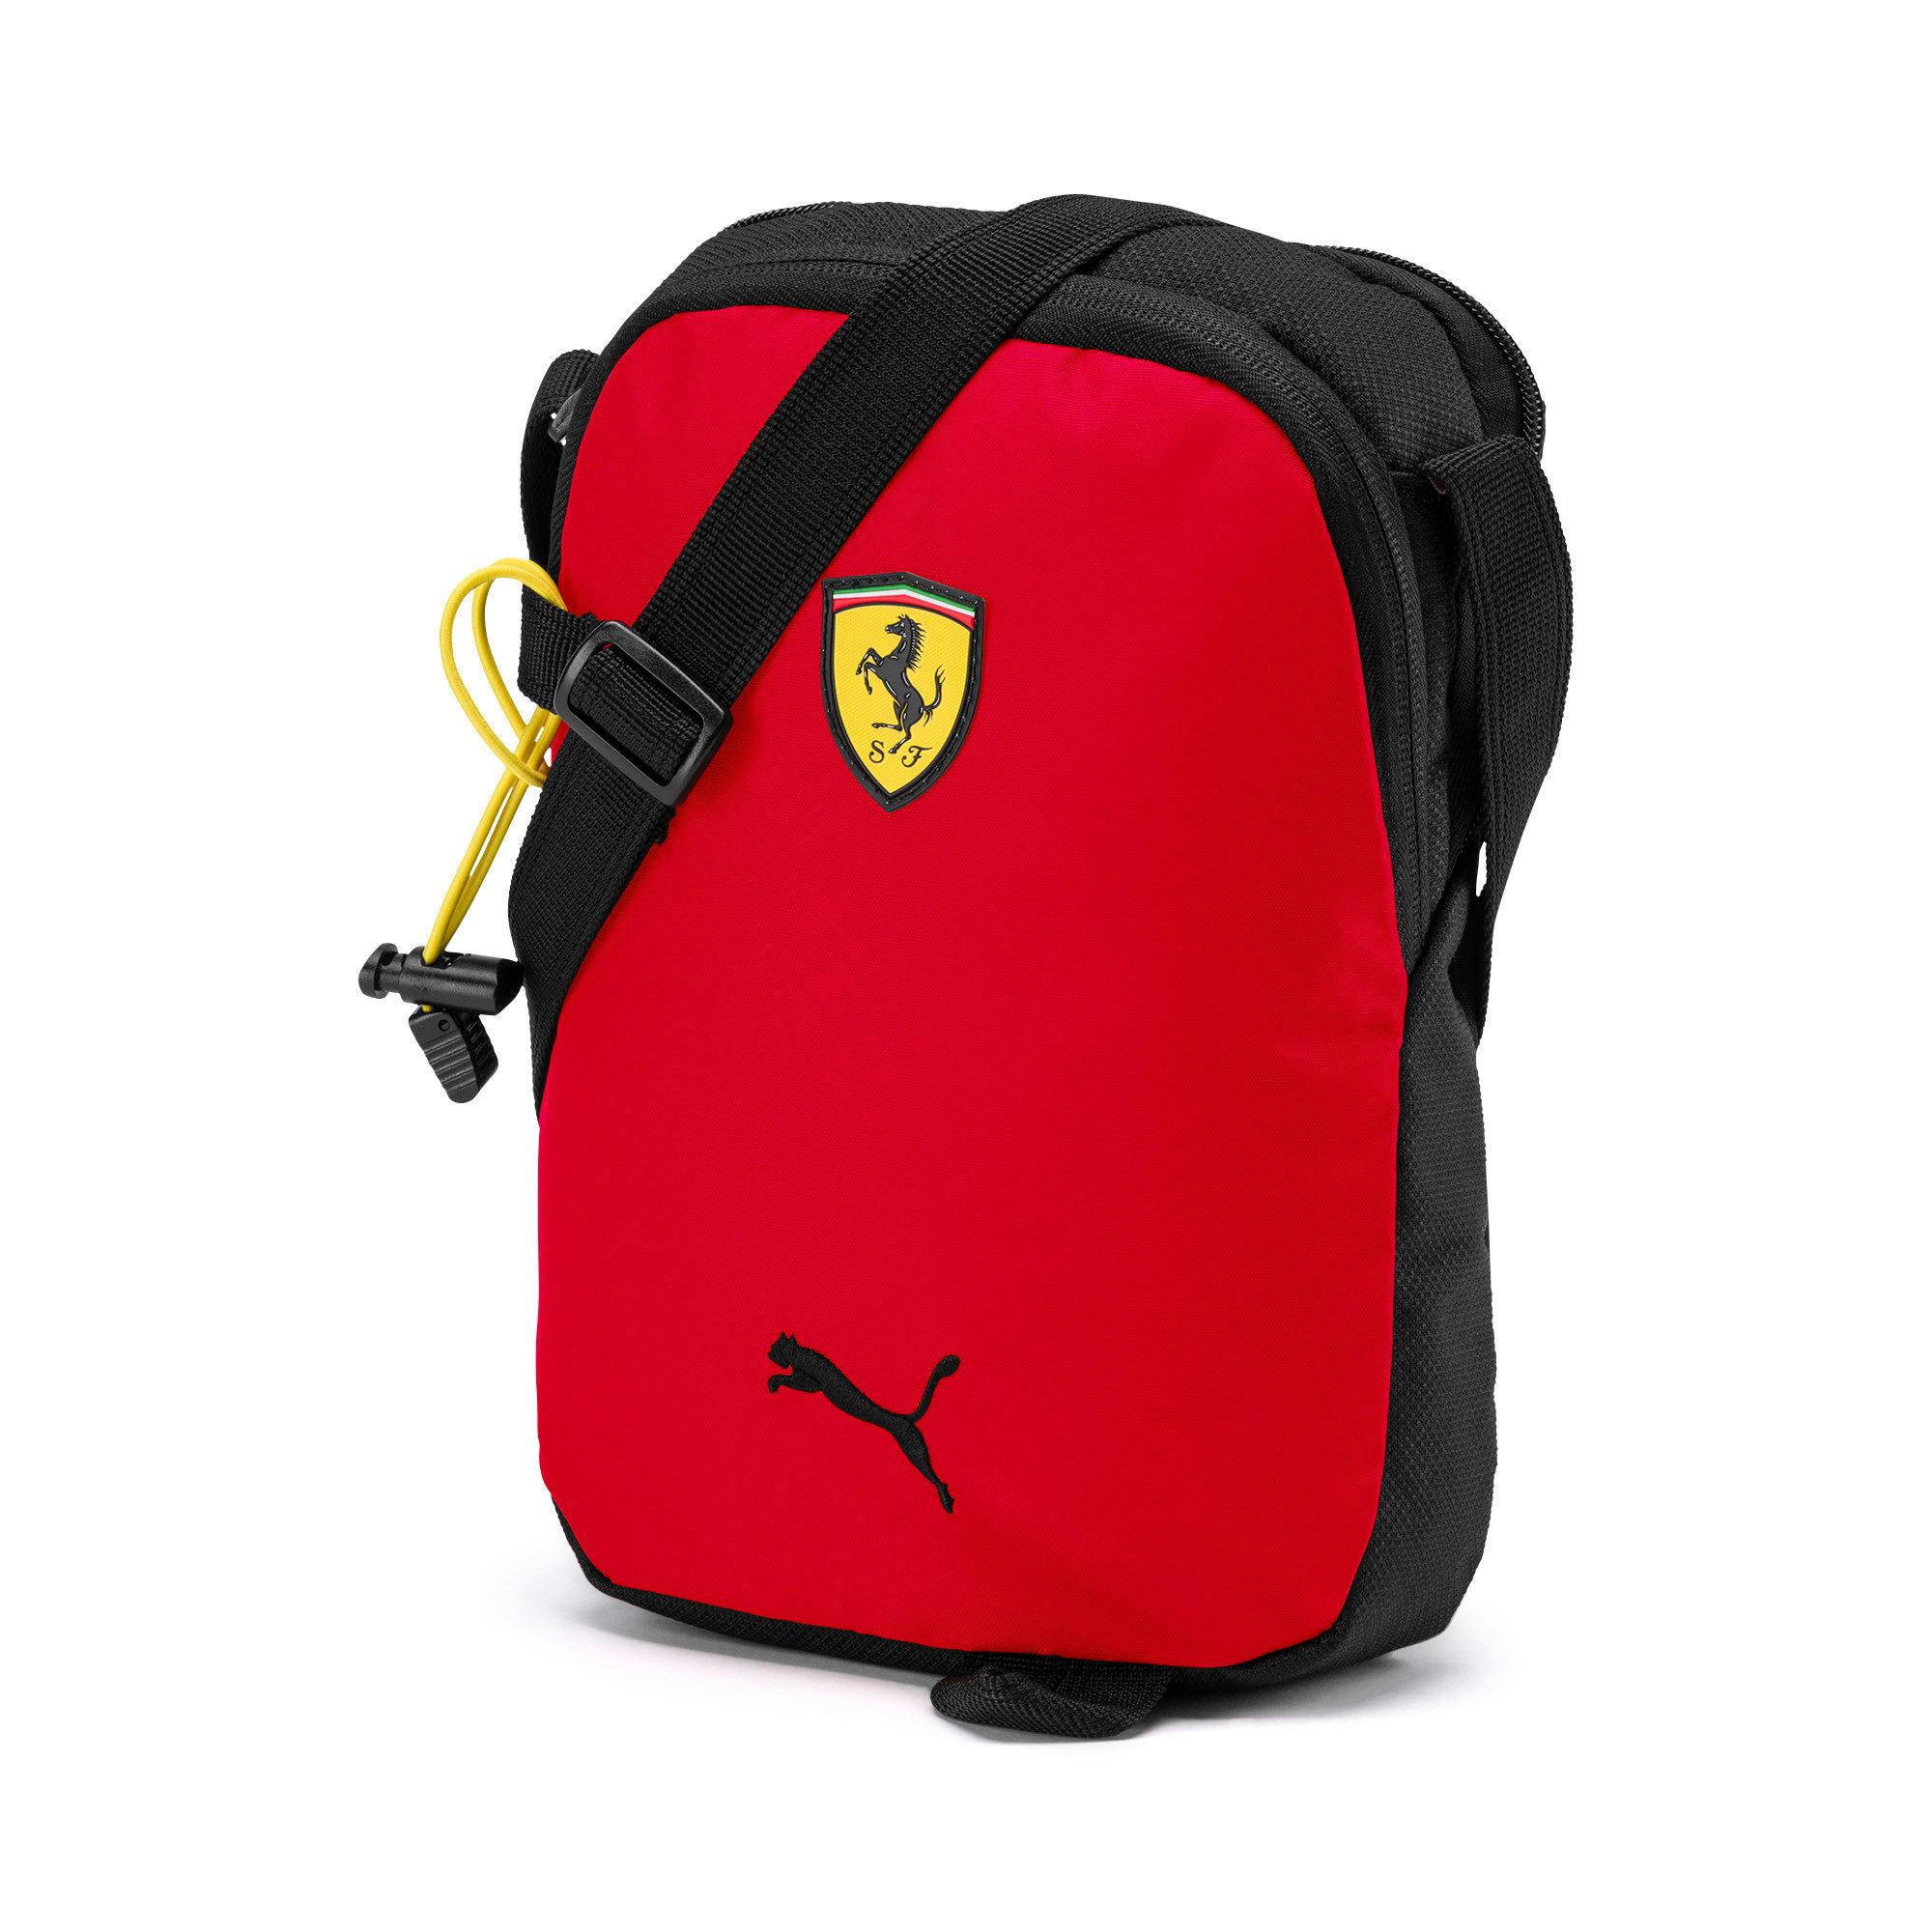 Thumbnail 1 of Scuderia Ferrari Fanwear Portable Bag, Rosso Corsa, medium